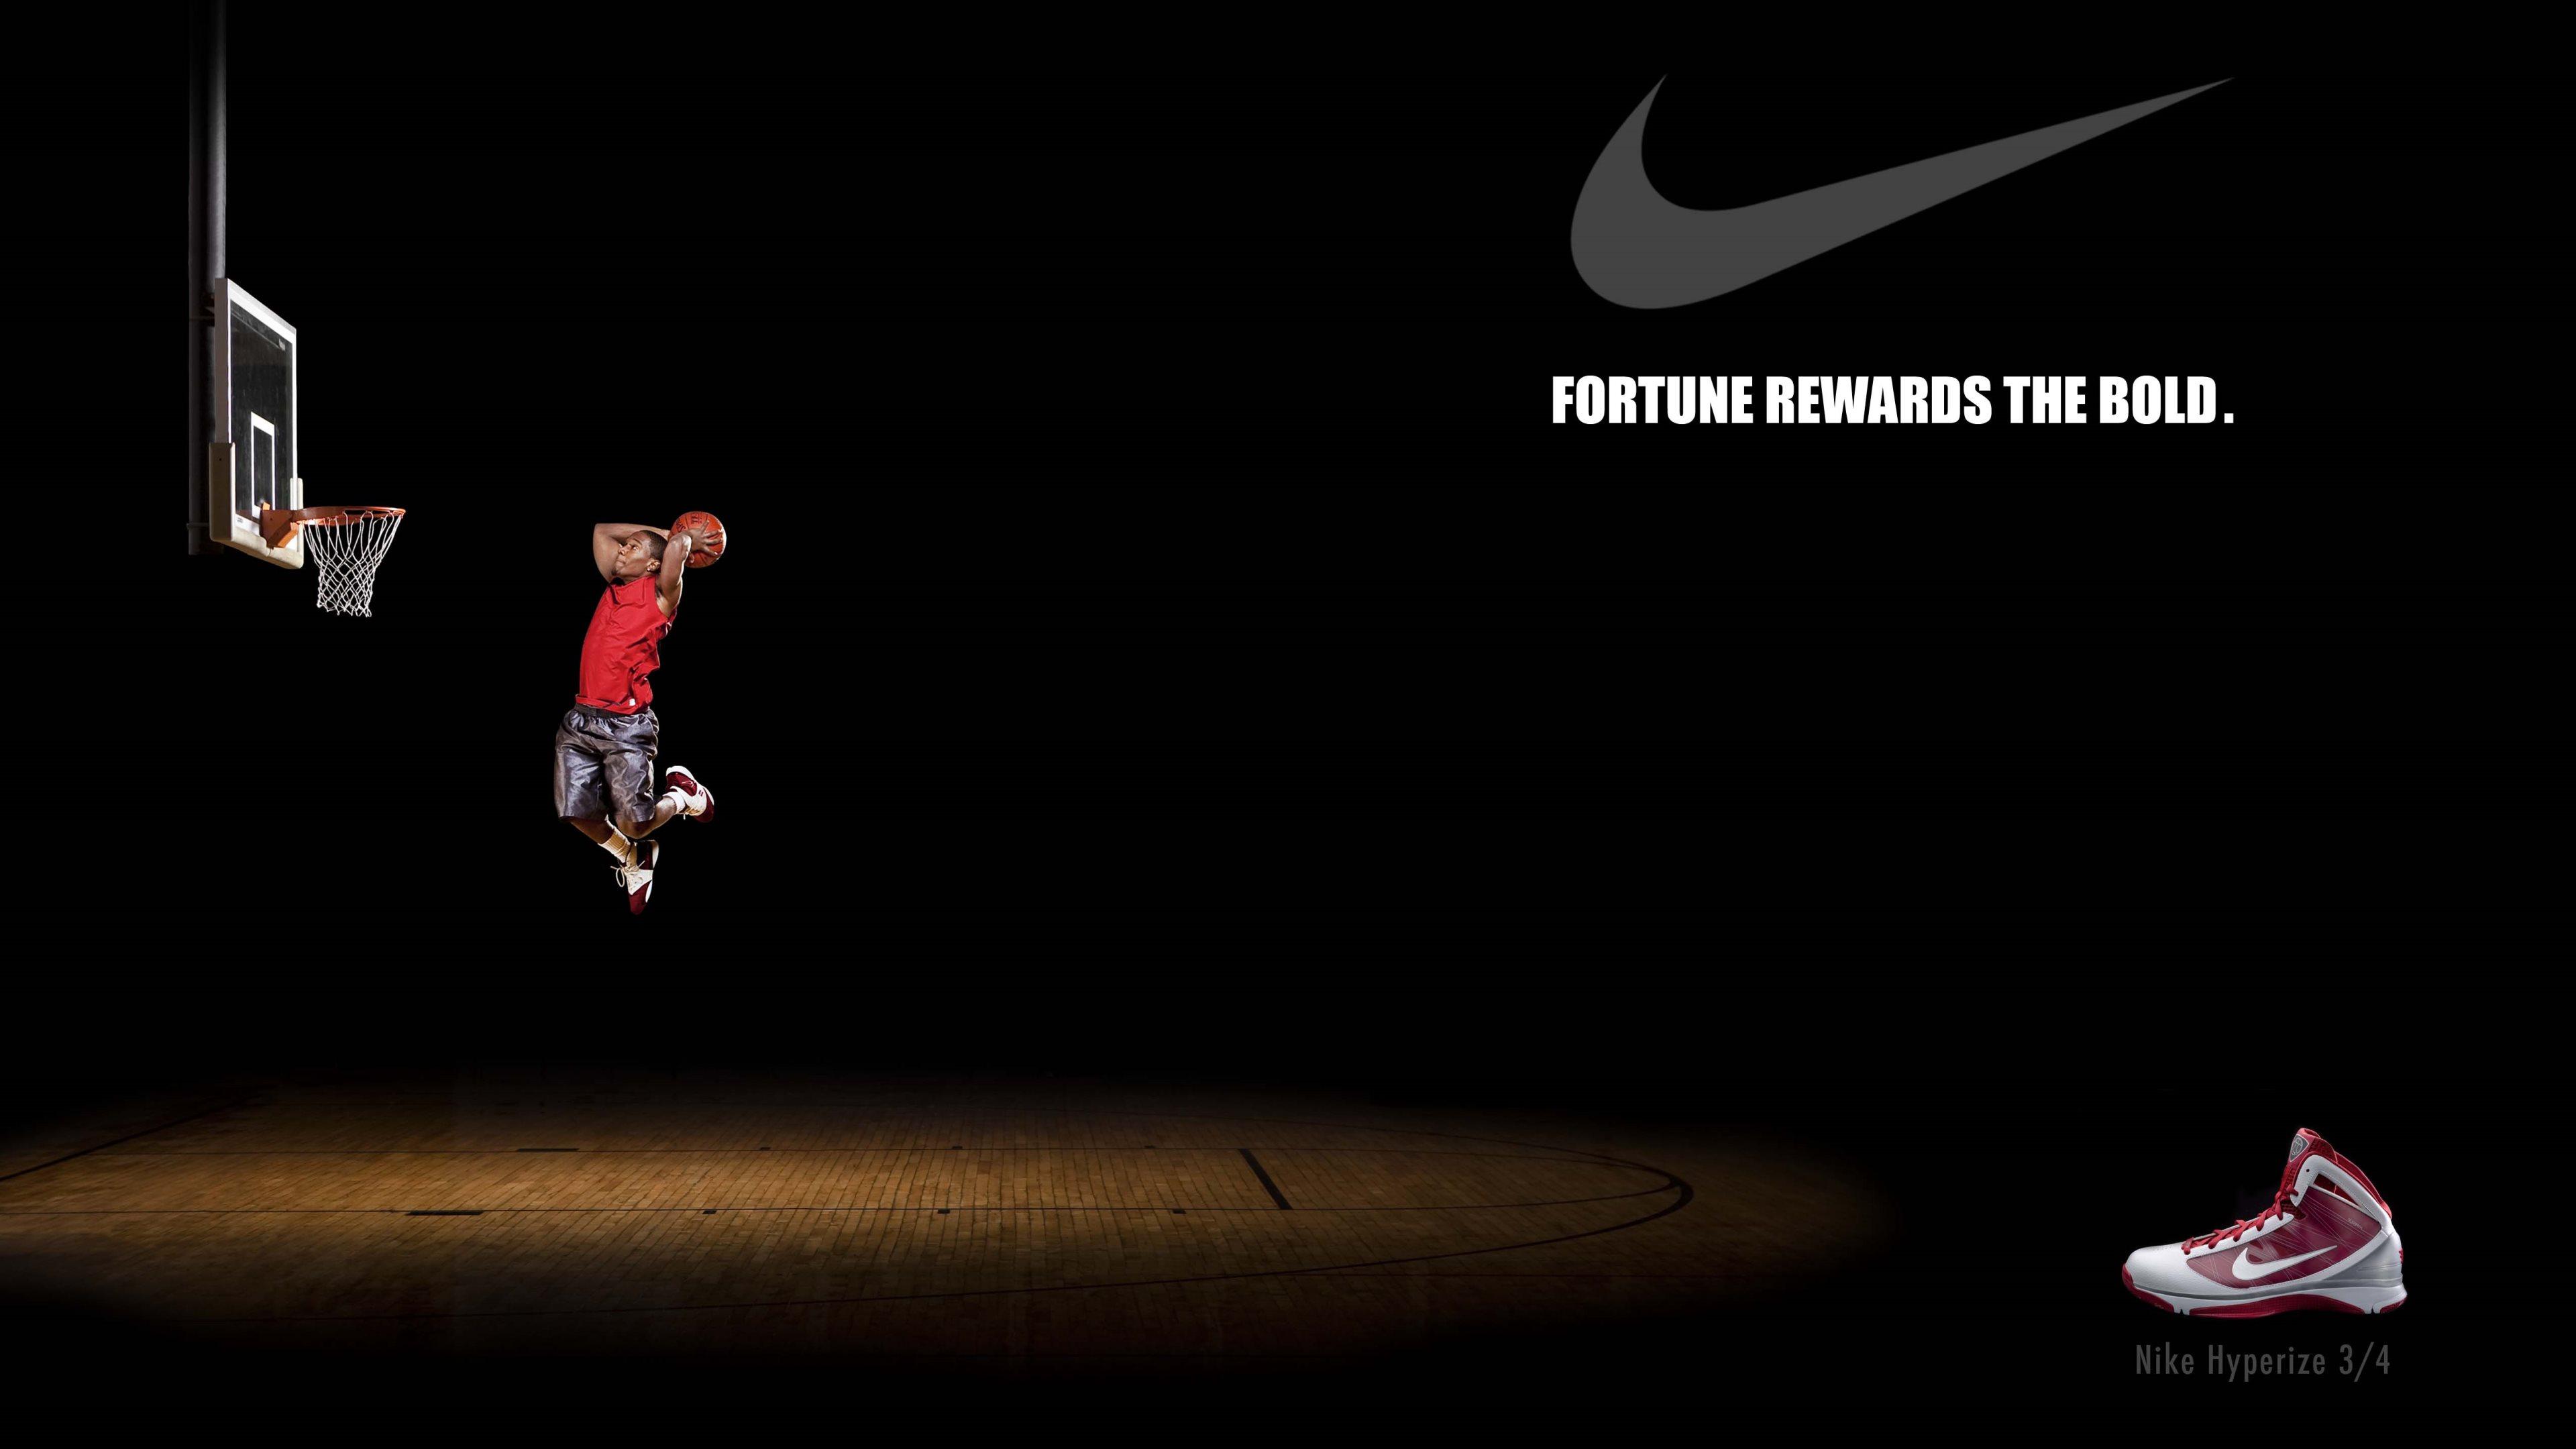 3840x2160px Nike Basketball Wallpaper